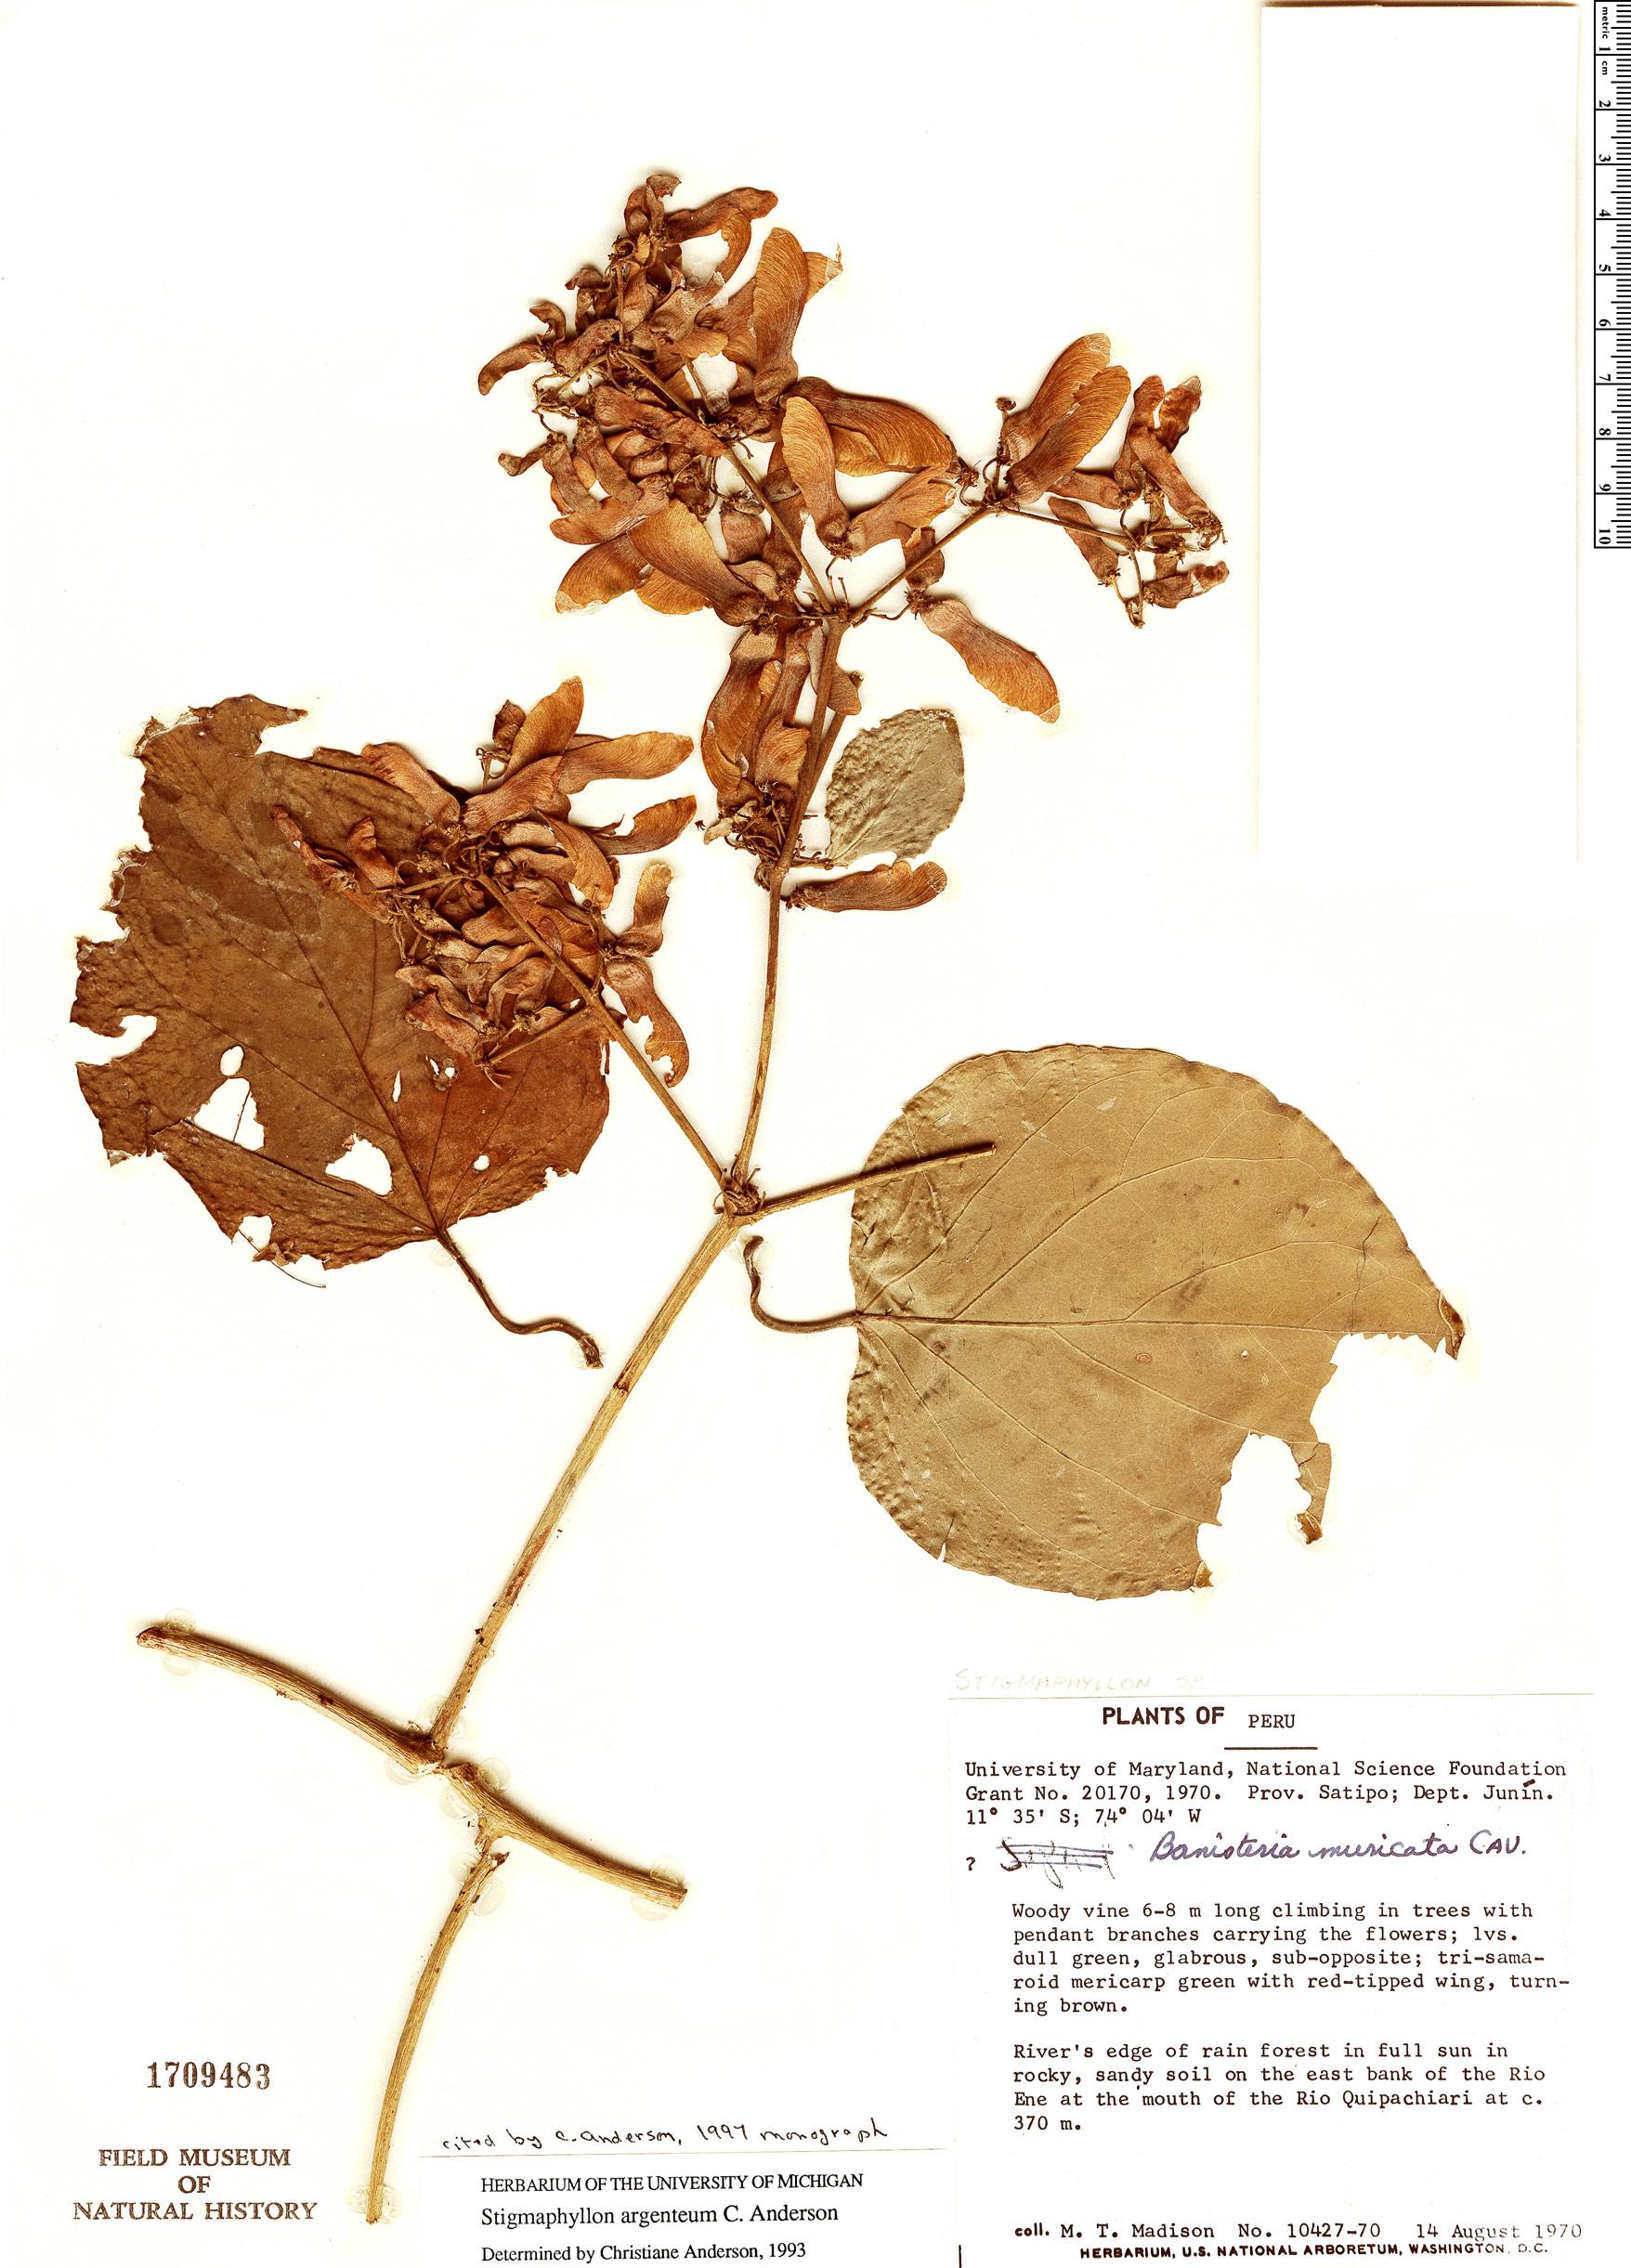 Specimen: Stigmaphyllon argenteum